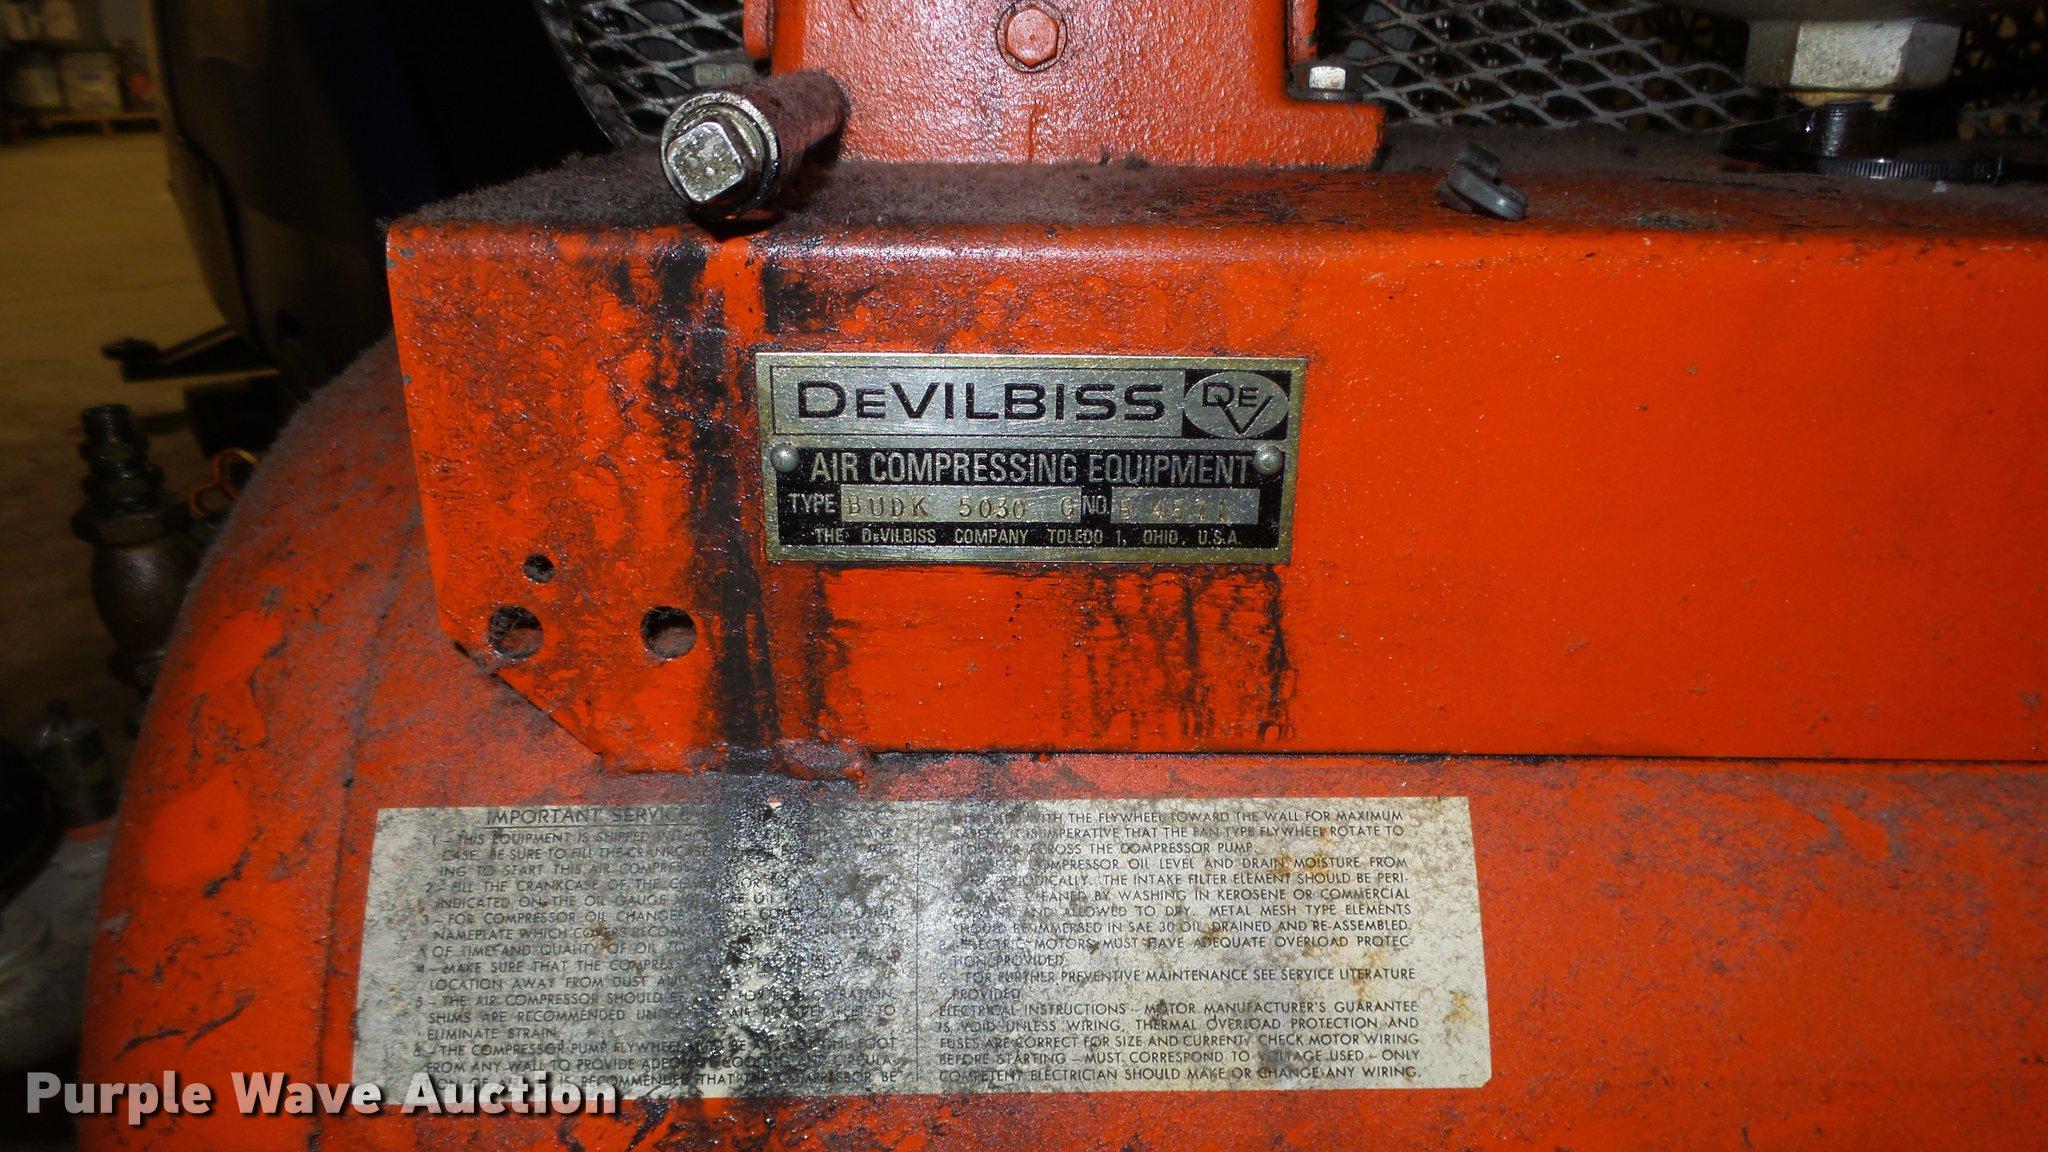 Devilbiss Air Compressor Item Er9628 Sold September 11 Commercial Wiring Full Size In New Window